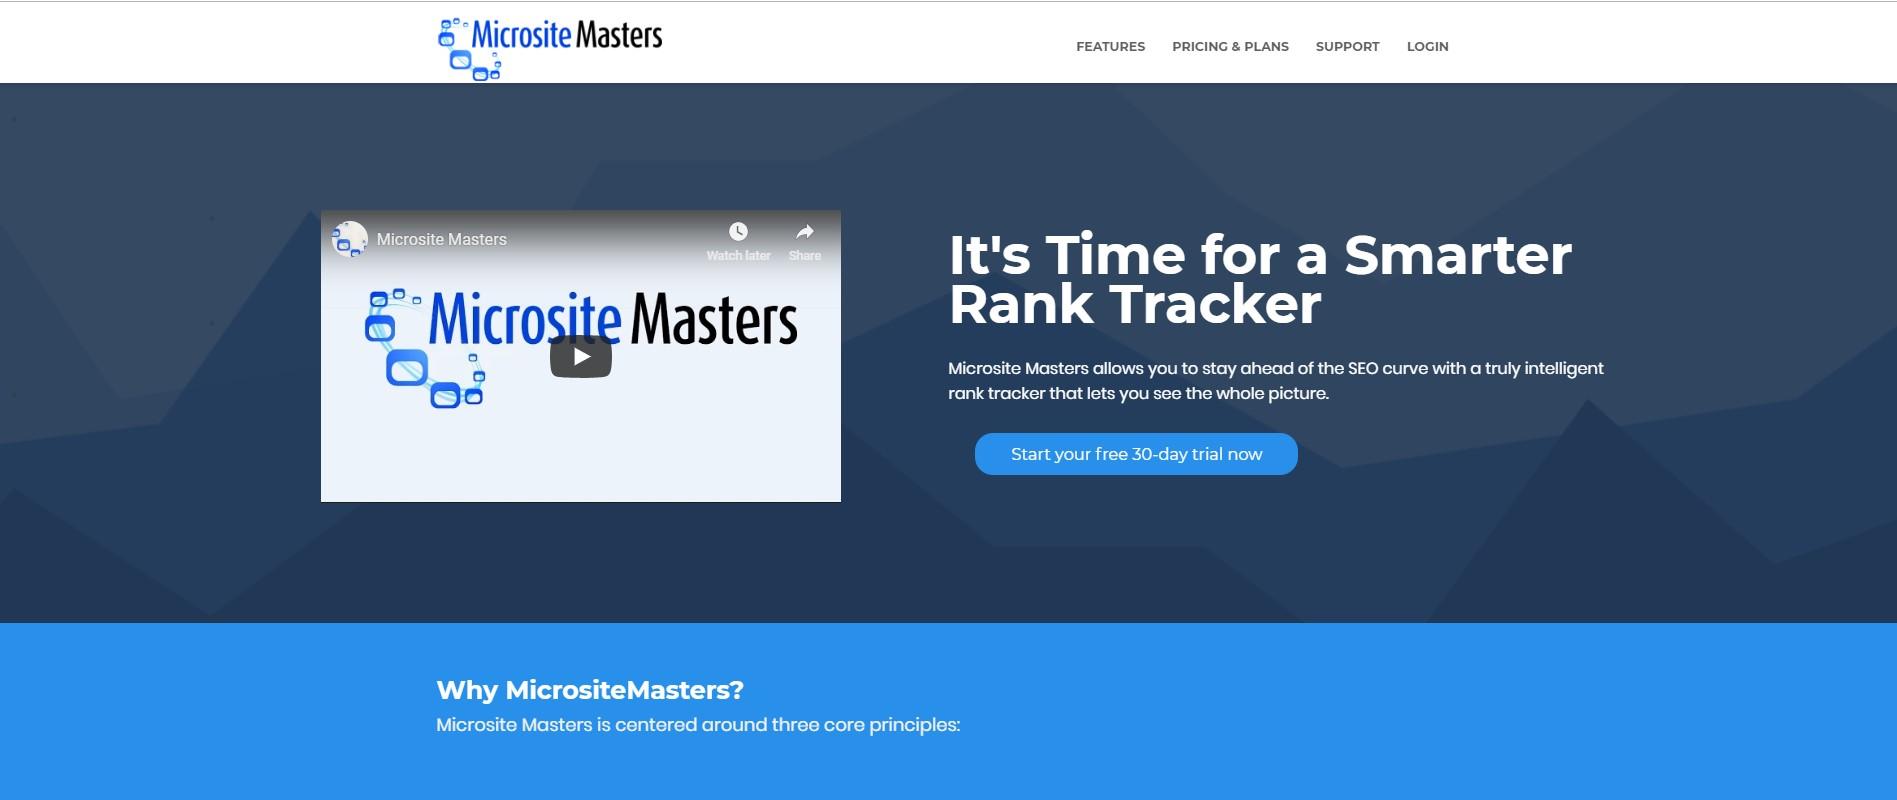 Microsite-Master-11